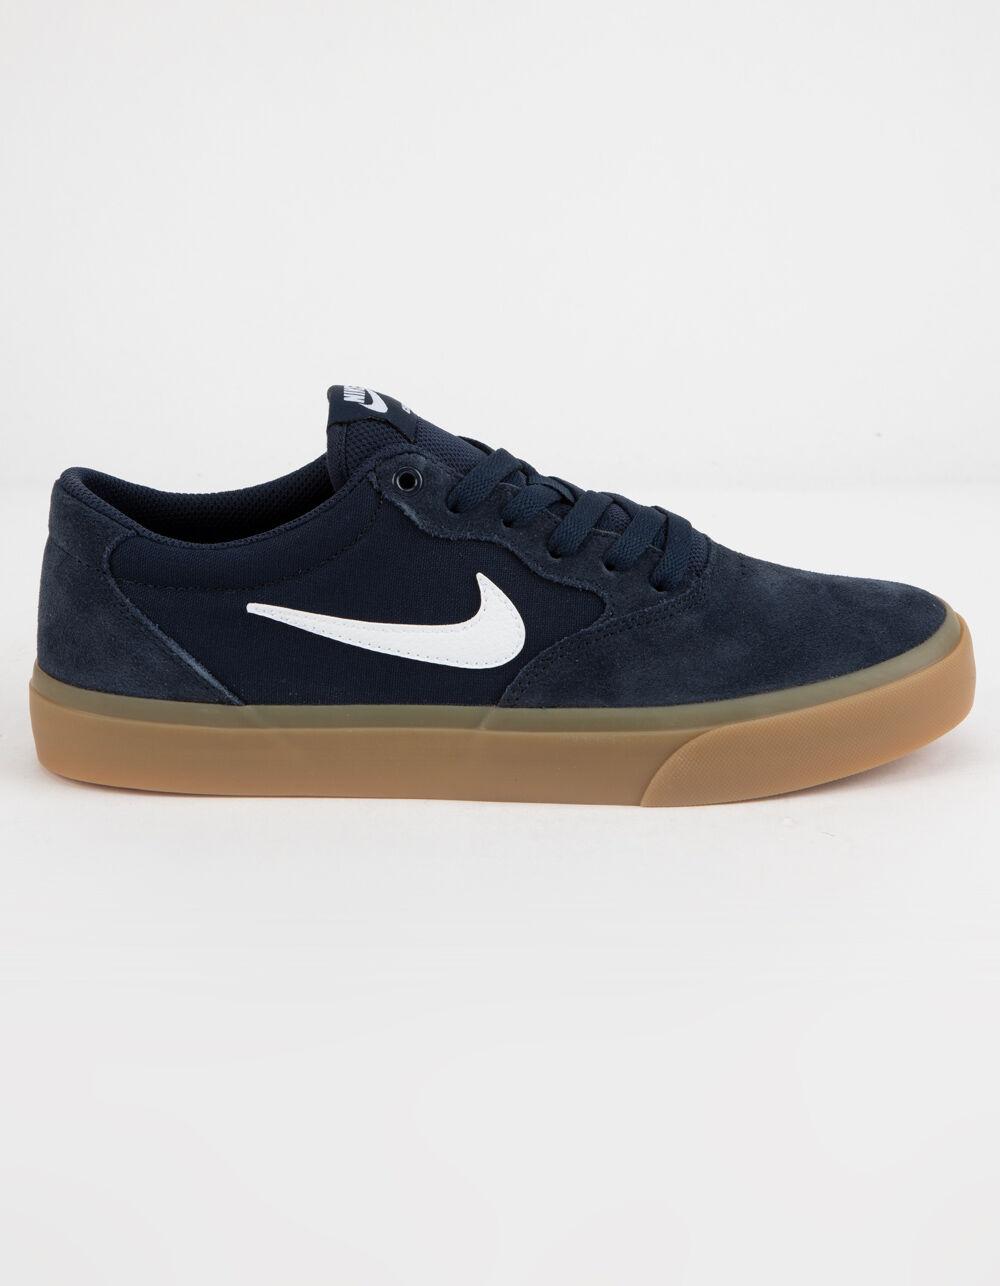 NIKE SB Chron SLR Navy Shoes